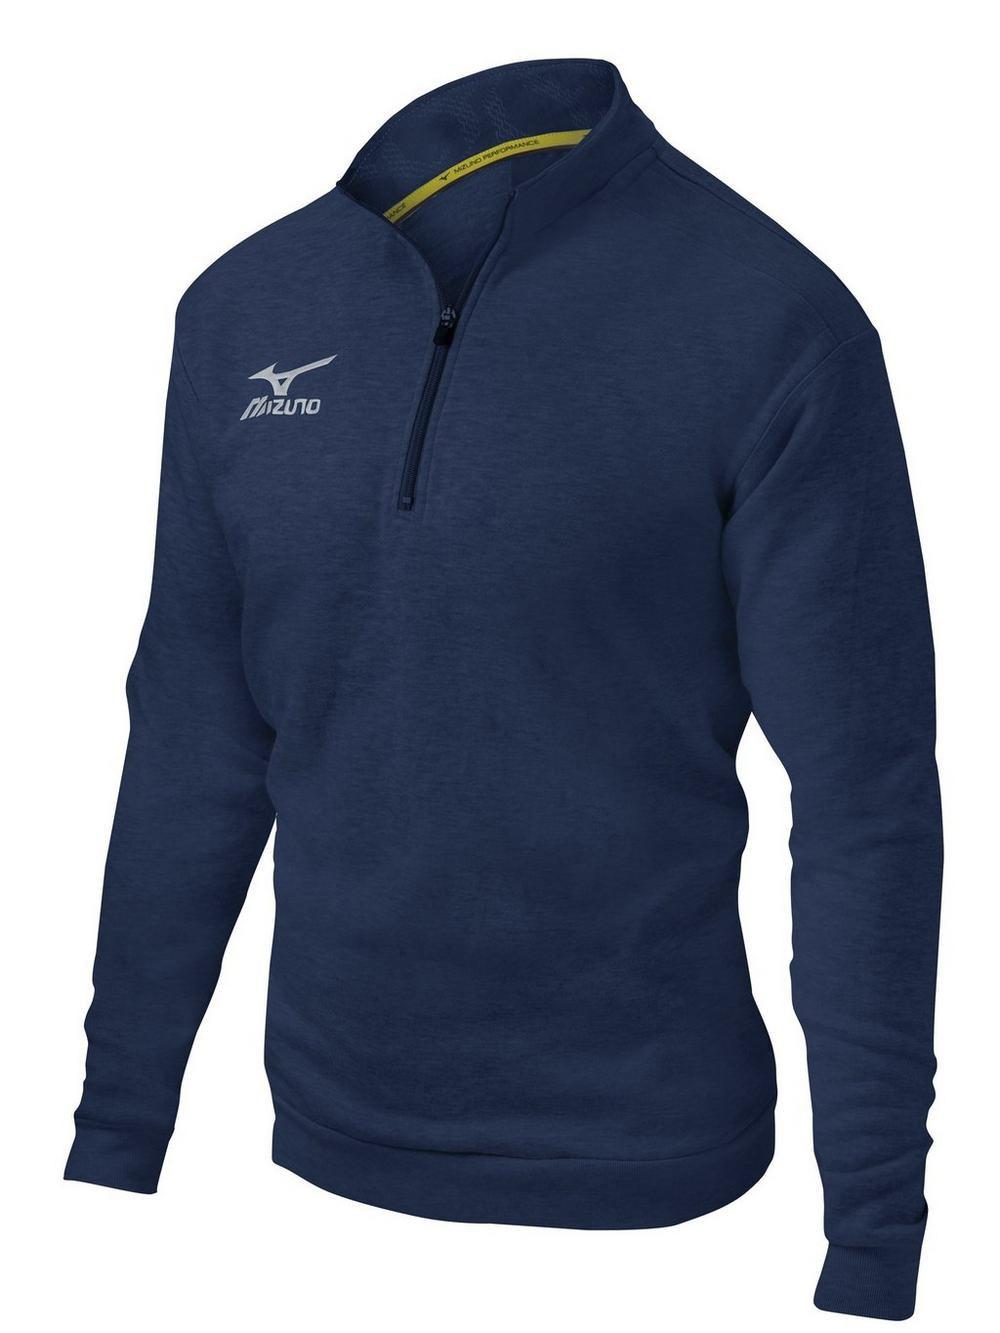 Mizuno 1 2 Zip Fleece Pullover Midwest Volleyball Warehouse